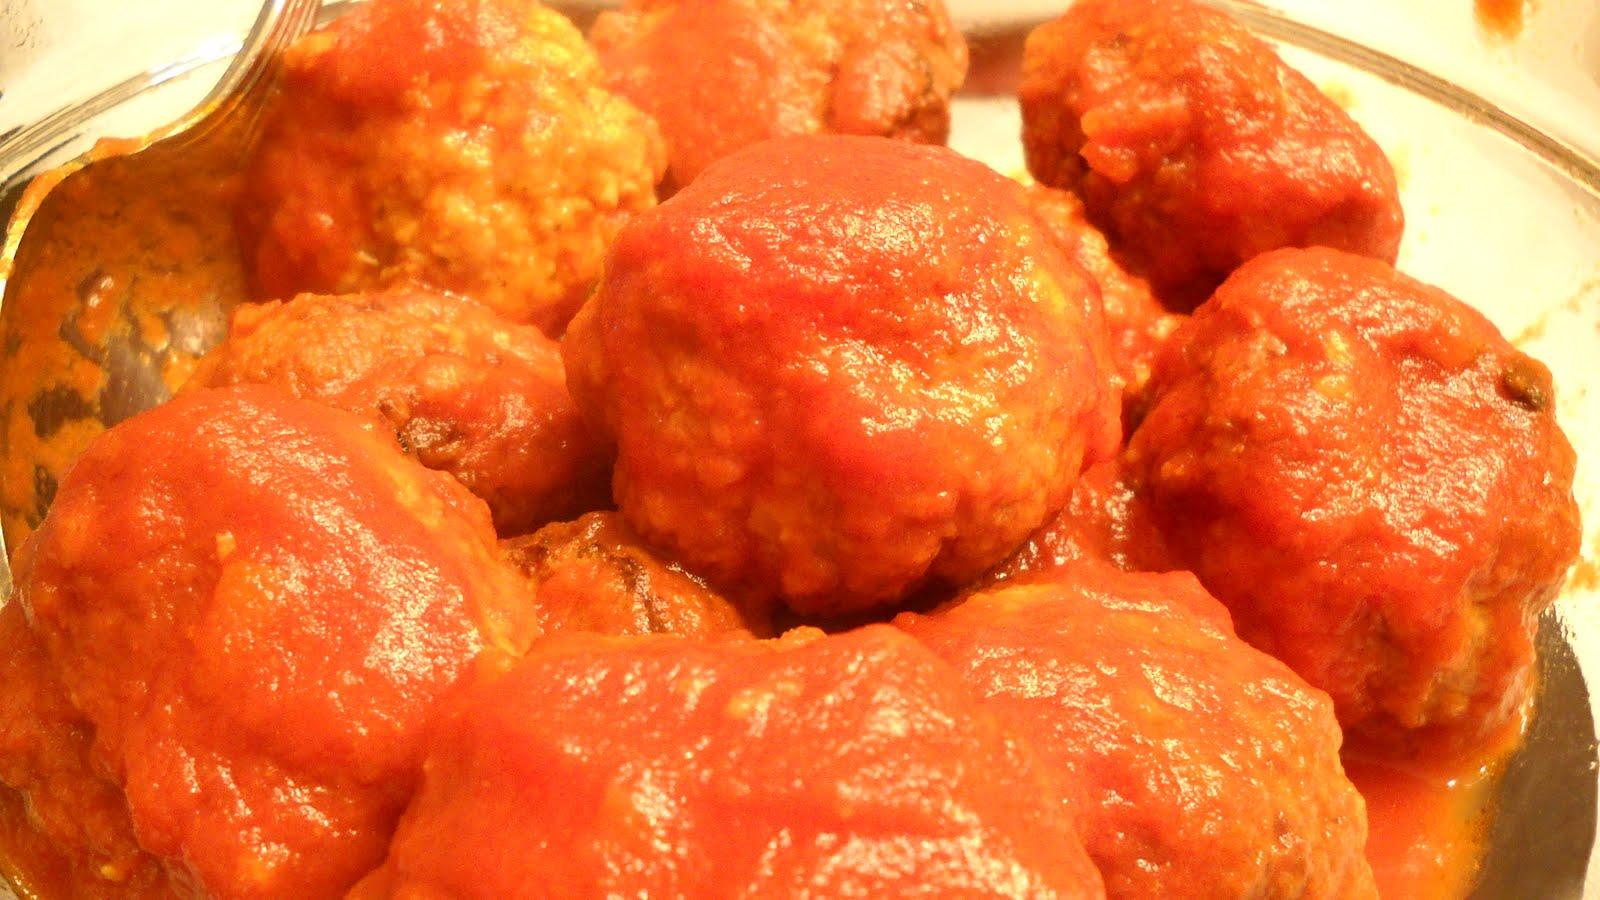 Cucina sarda polpette di carne di mista al sugo ricette for Cucina italiana ricette carne